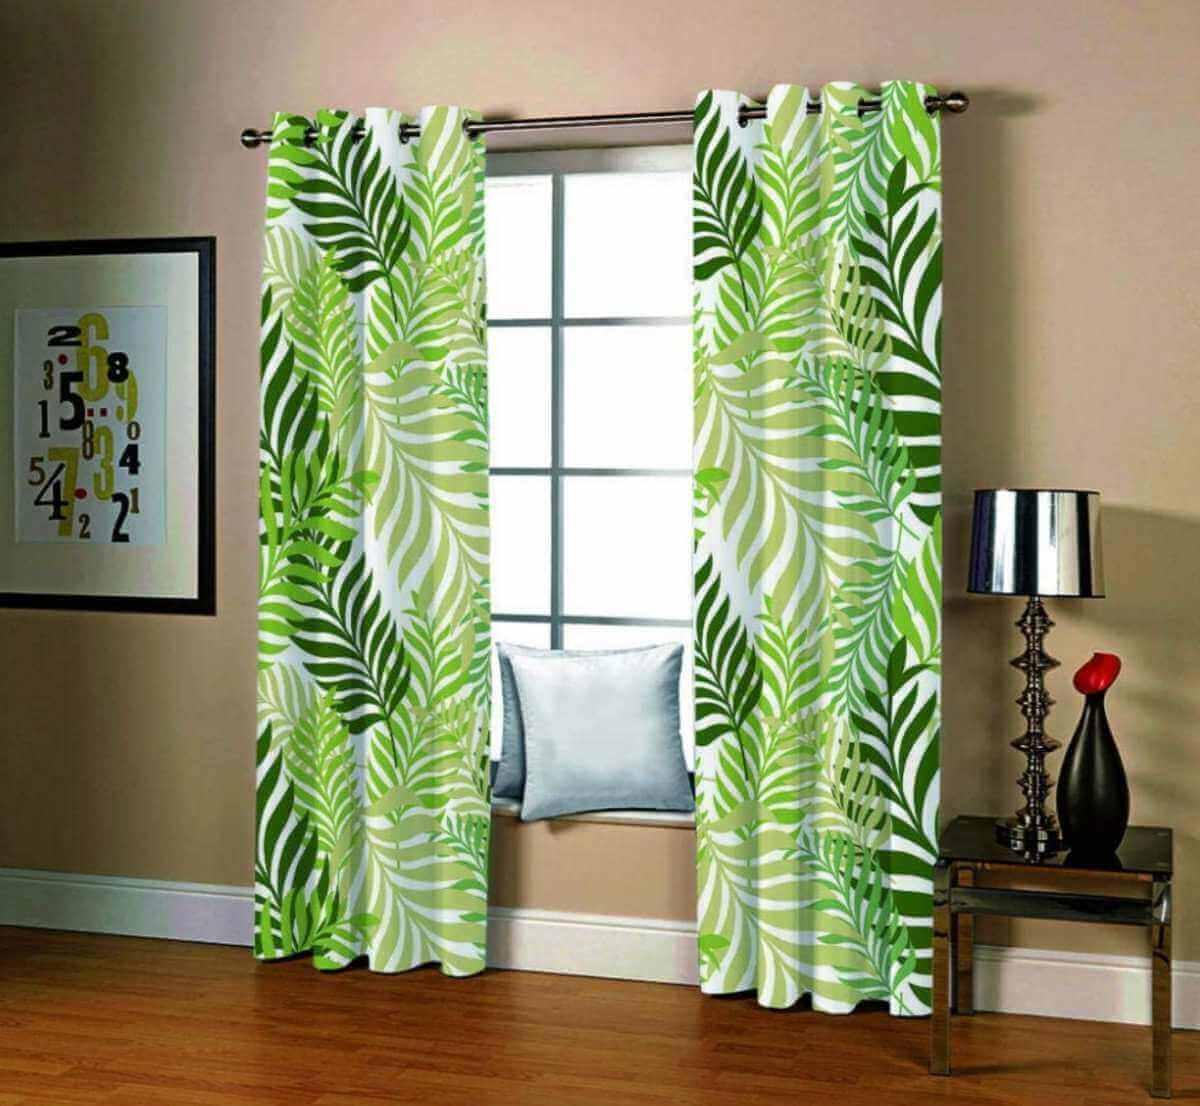 Estampas para as cortinas da casa